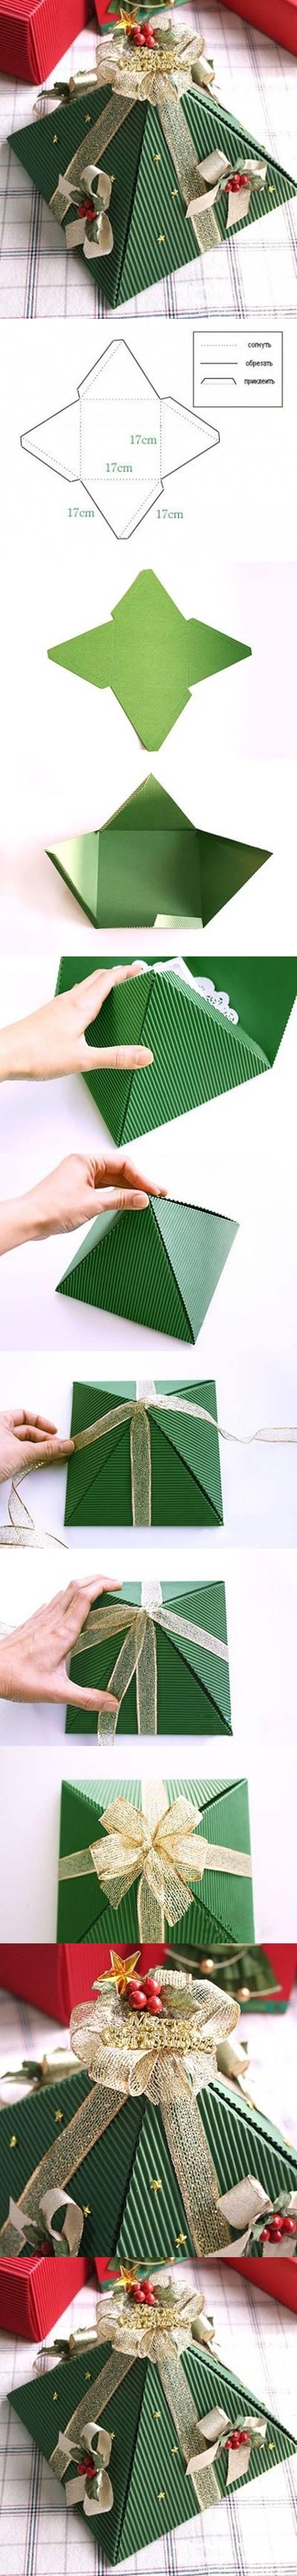 DIY Pyramid Christmas Box DIY Projects | UsefulDIY.com